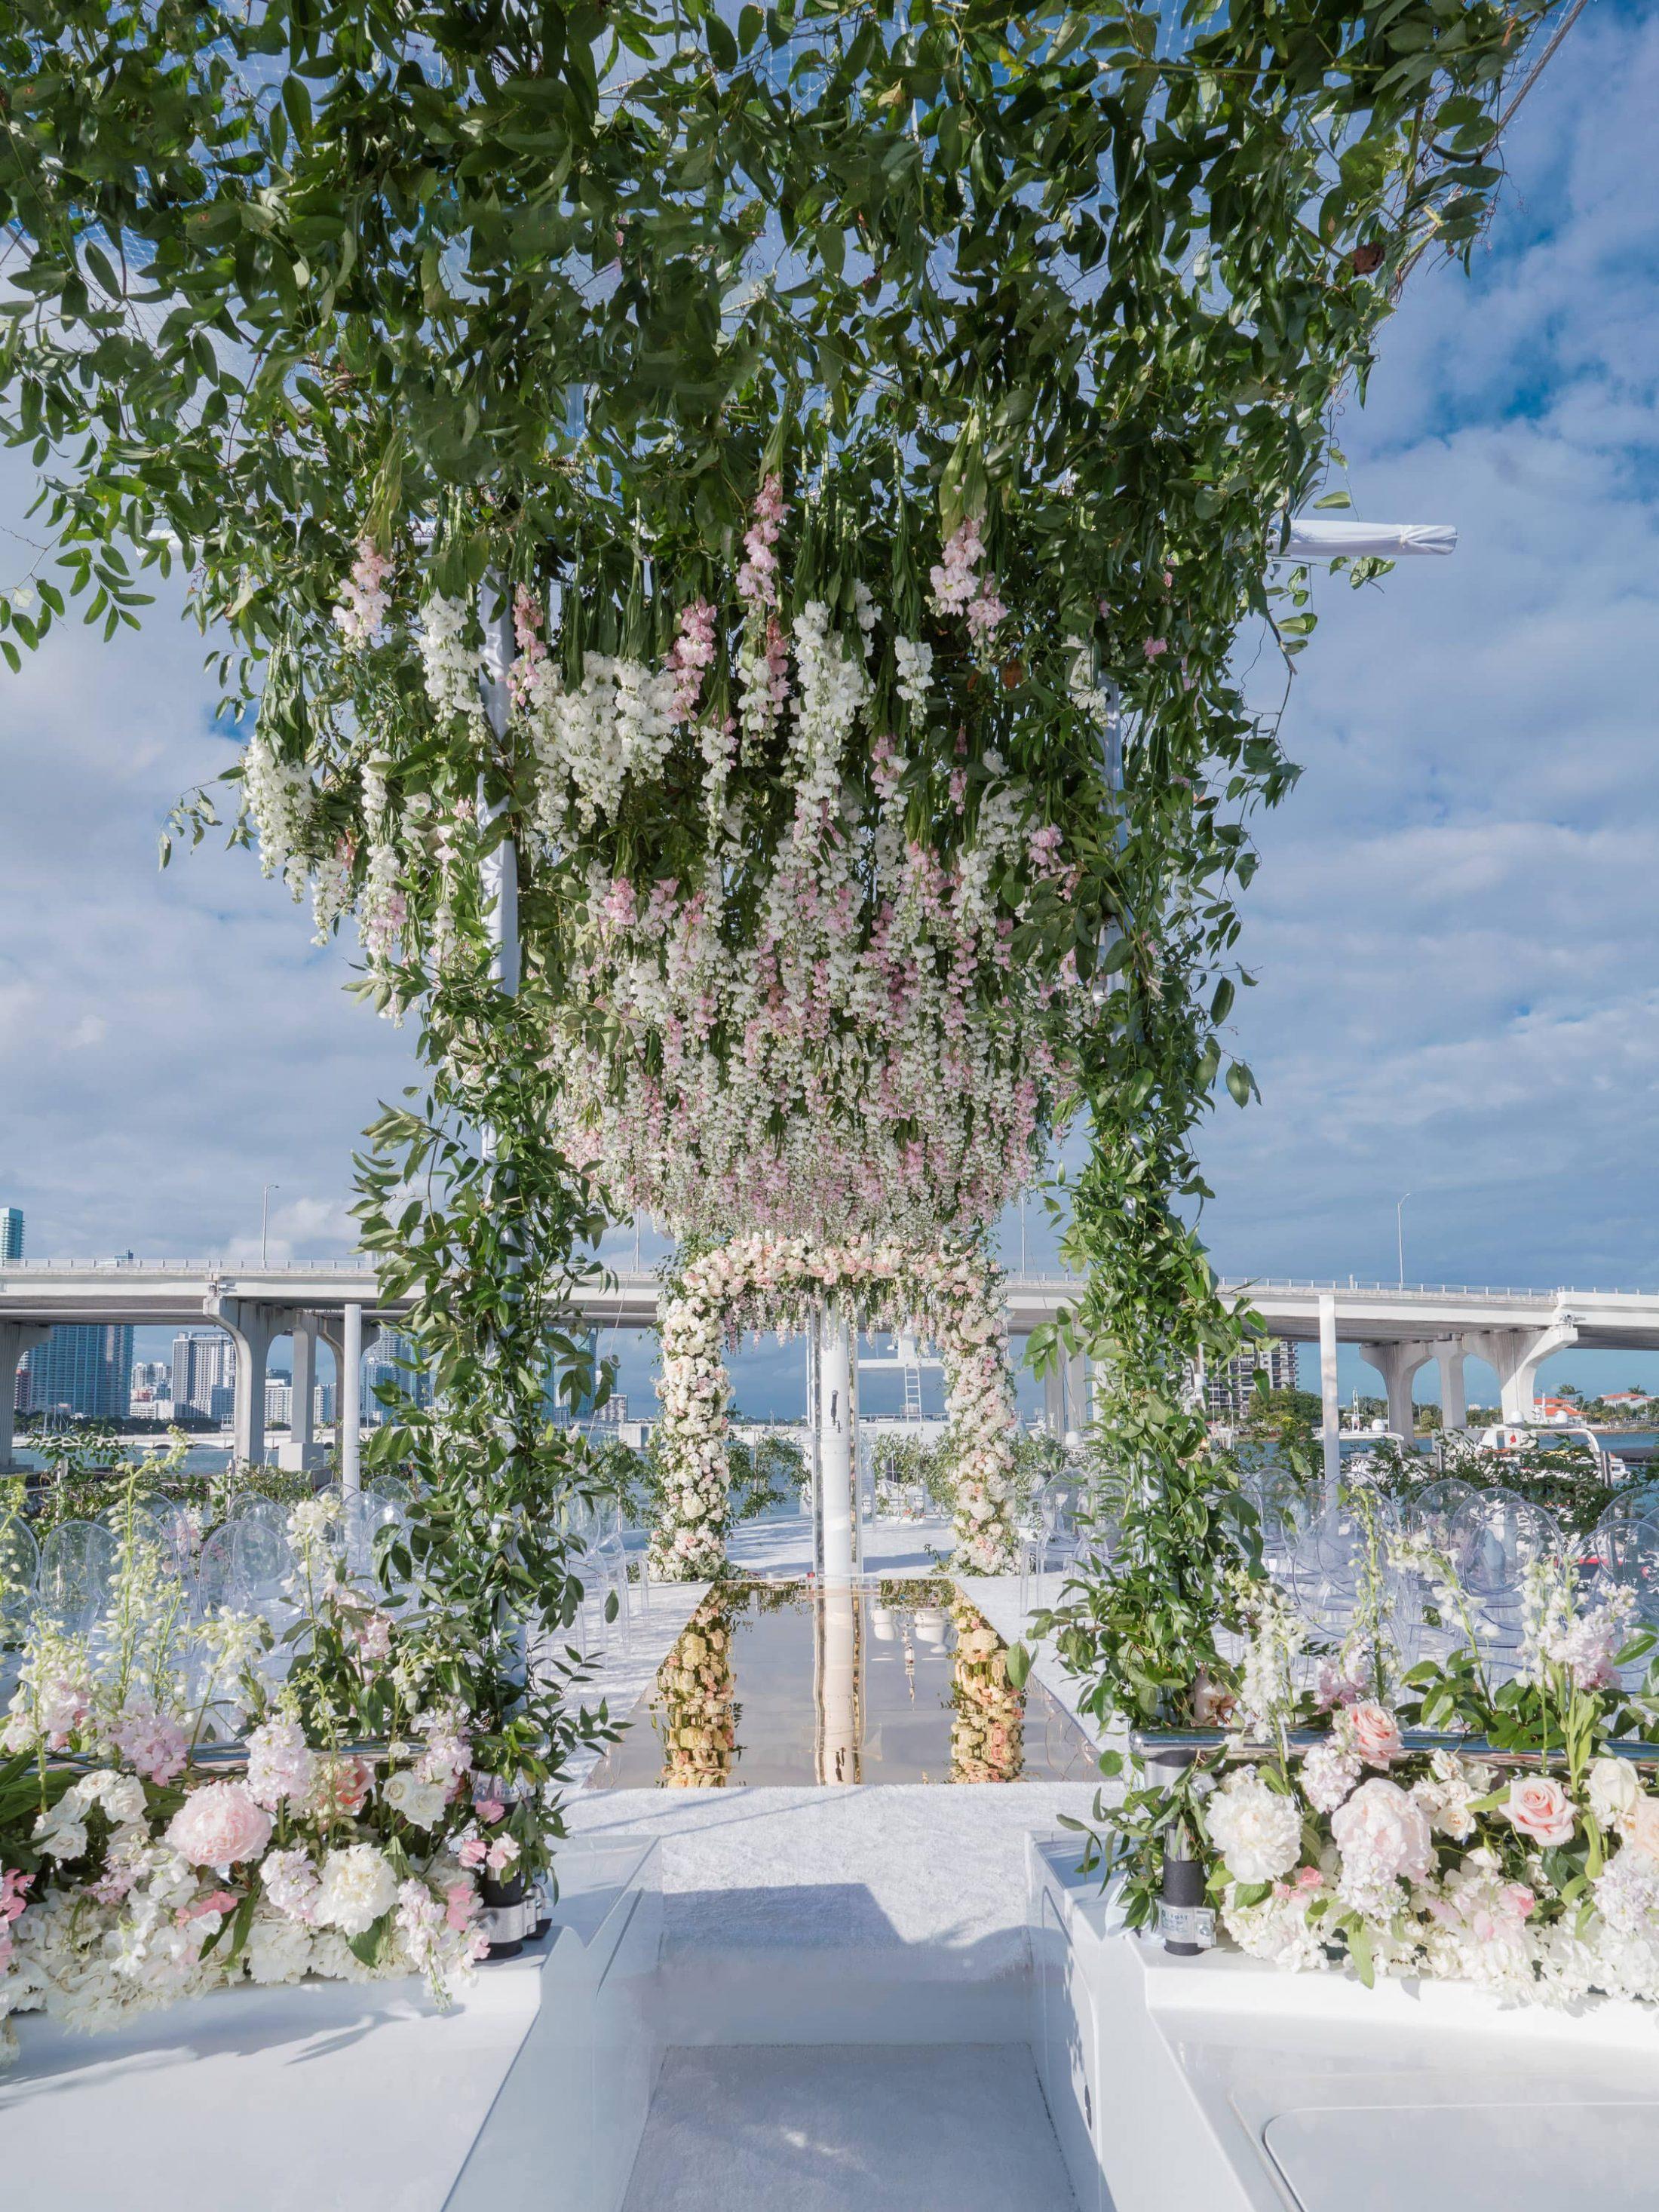 Glamorous aisle underneath cascading flowers at this Miami yacht wedding | Photo by Corbin Gurkin